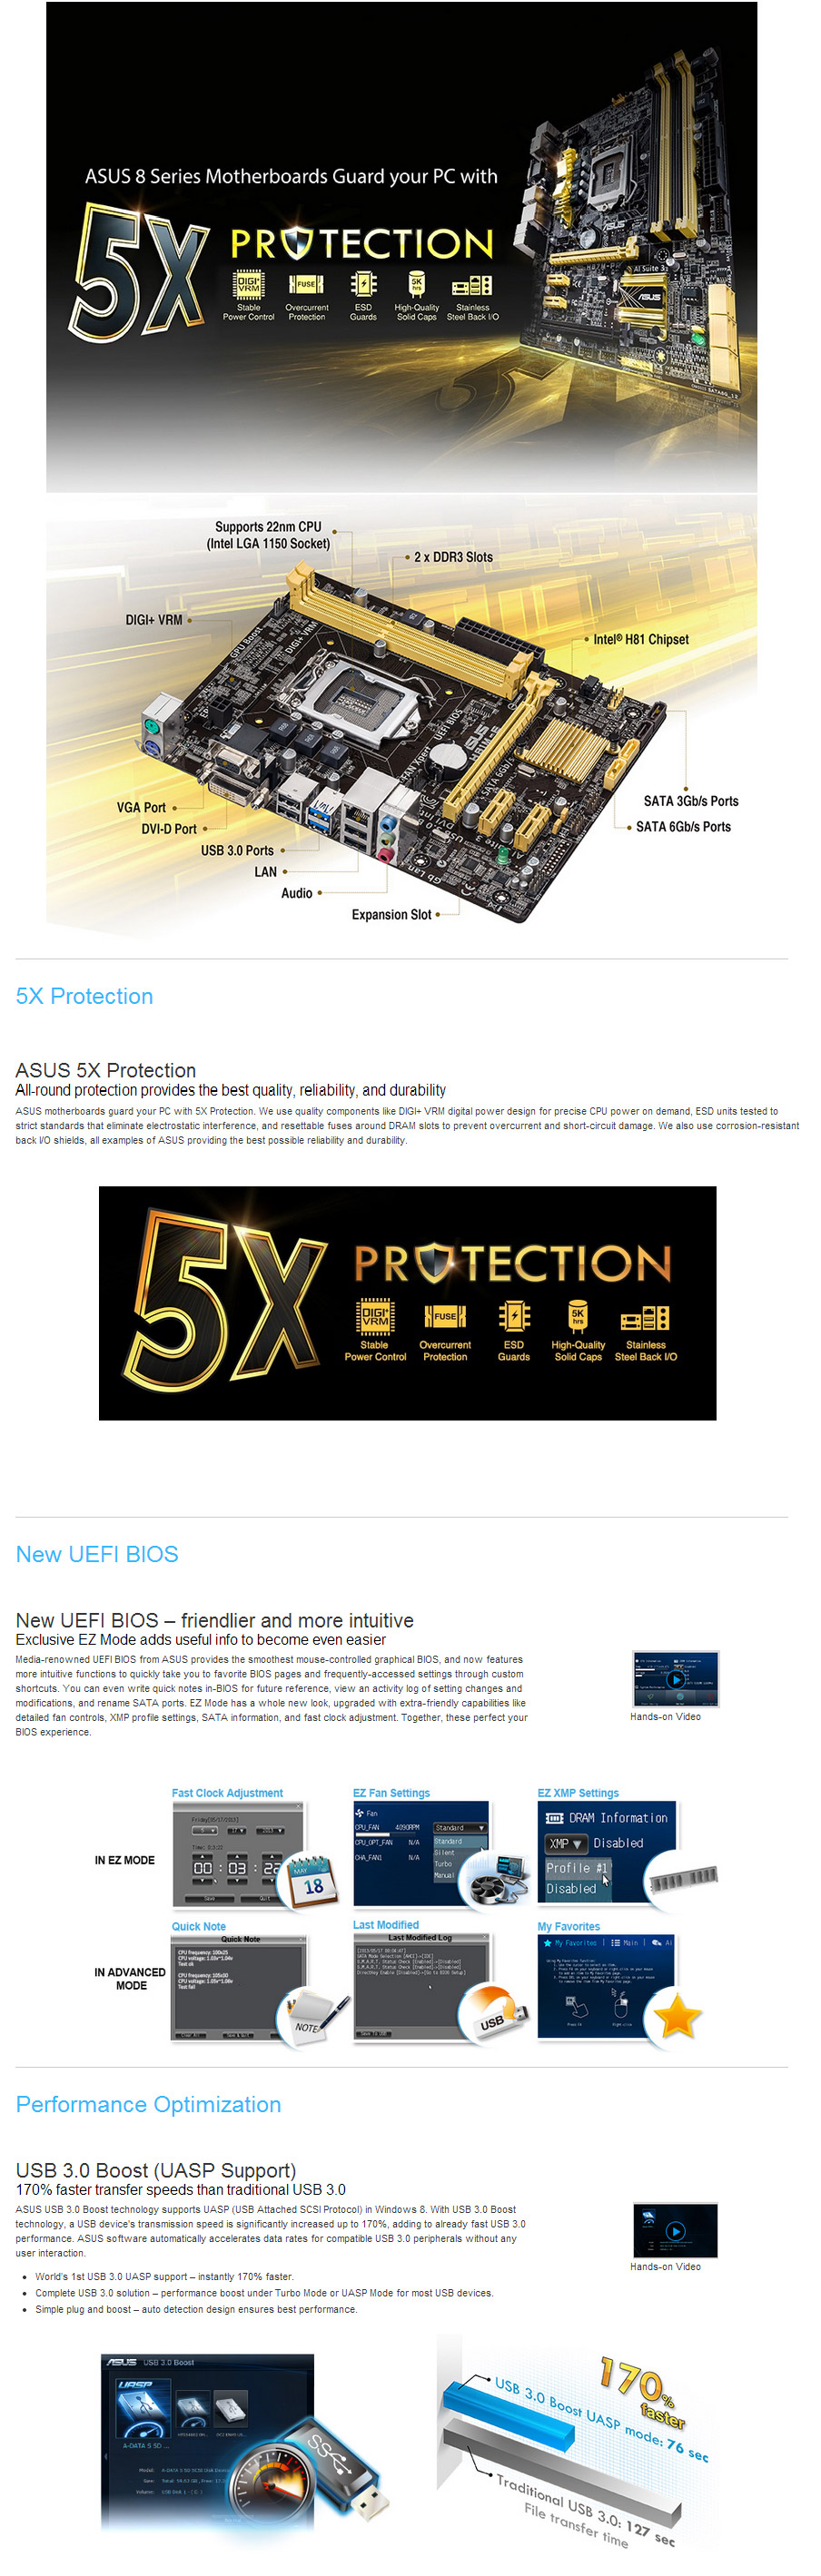 ASUS H81M E Motherboard H81M E PC Case Gear